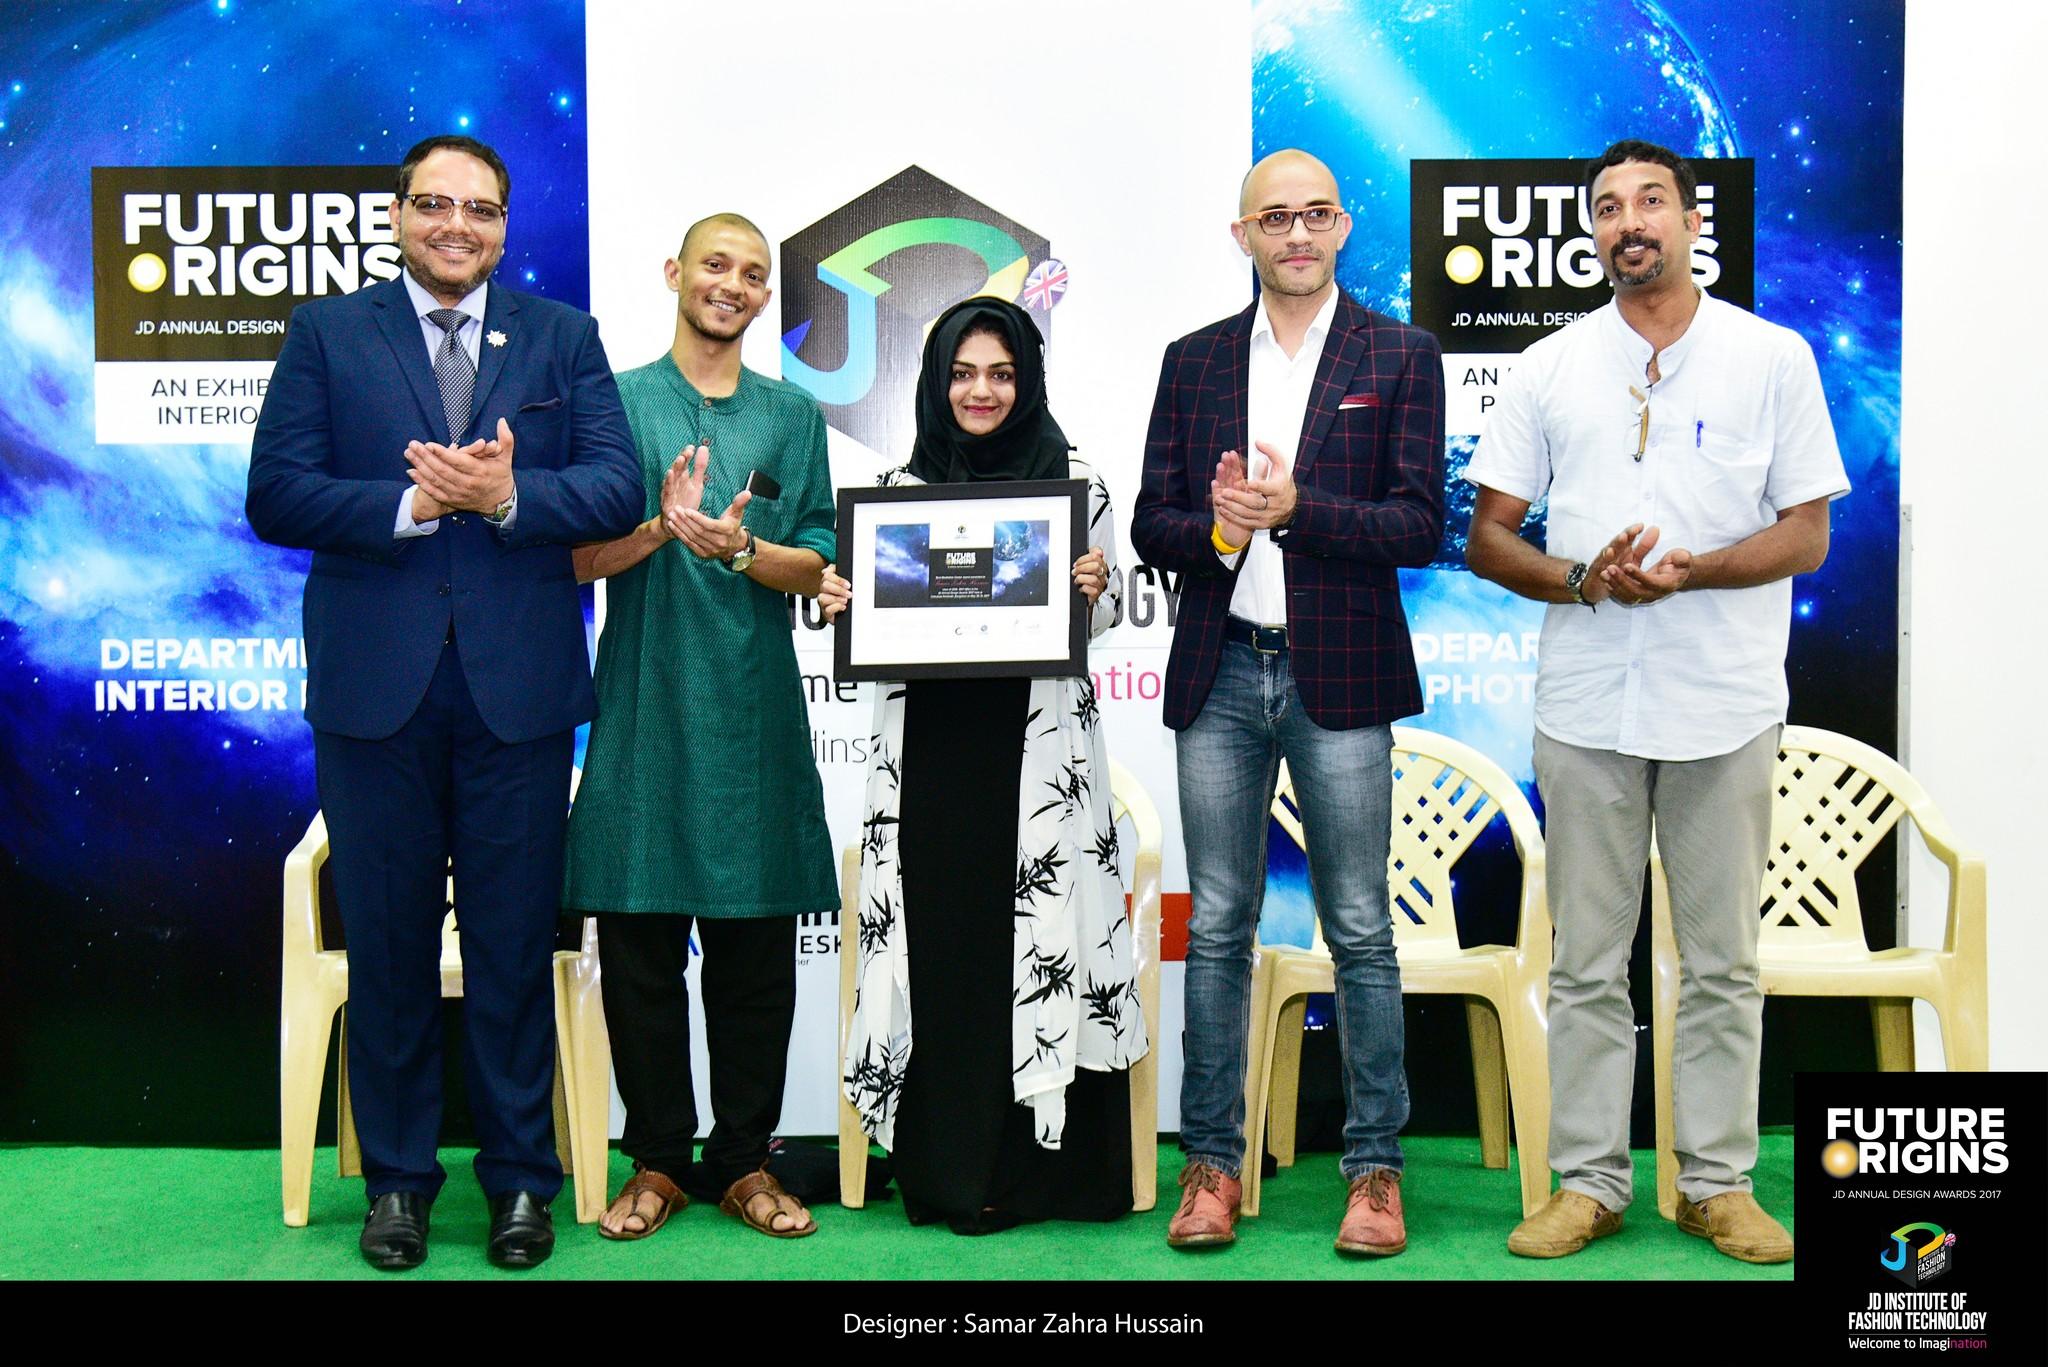 Cosmid – Future Origin – JD Annual Design Awards 2017 - Interior Design | Photography : Jerin Nath (@jerin_nath) cosmid - Cosmid     Future Origin     JD Annual Design Awards 2017 2 - Cosmid – Future Origin – JD Annual Design Awards 2017